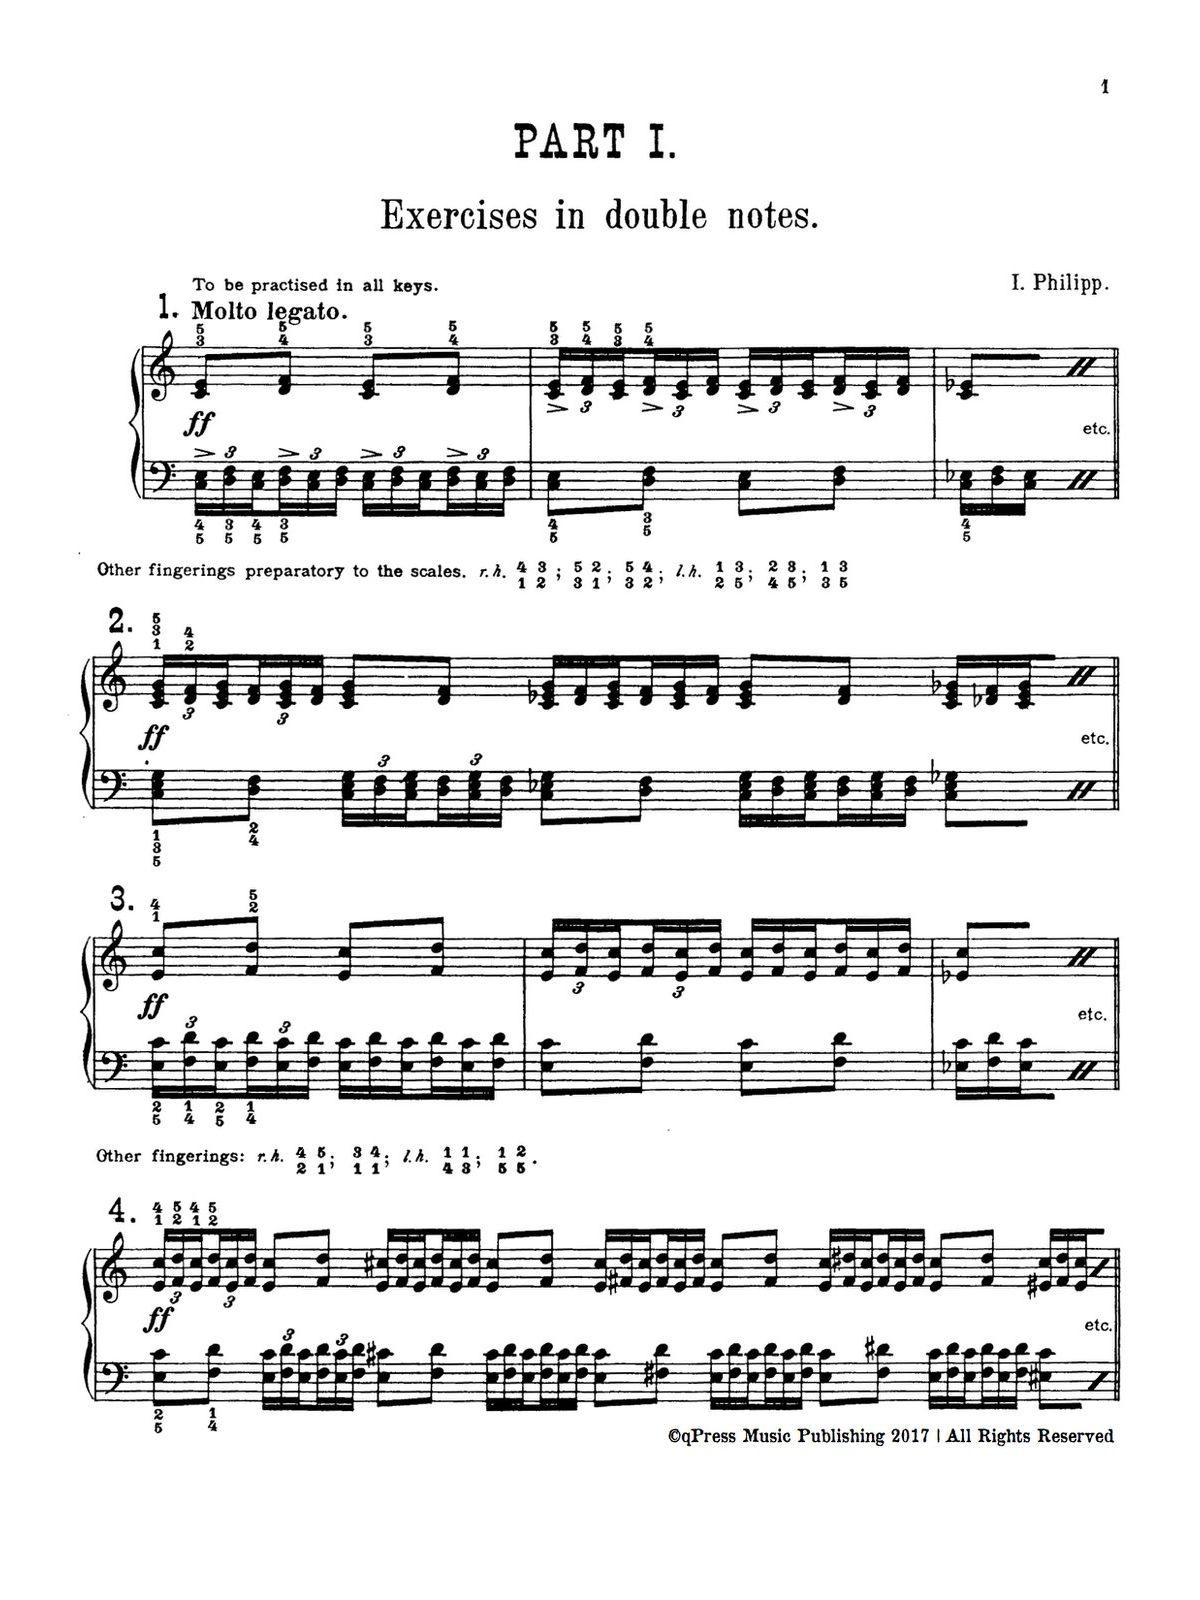 Philipp, School of Double Notes Complete-p005